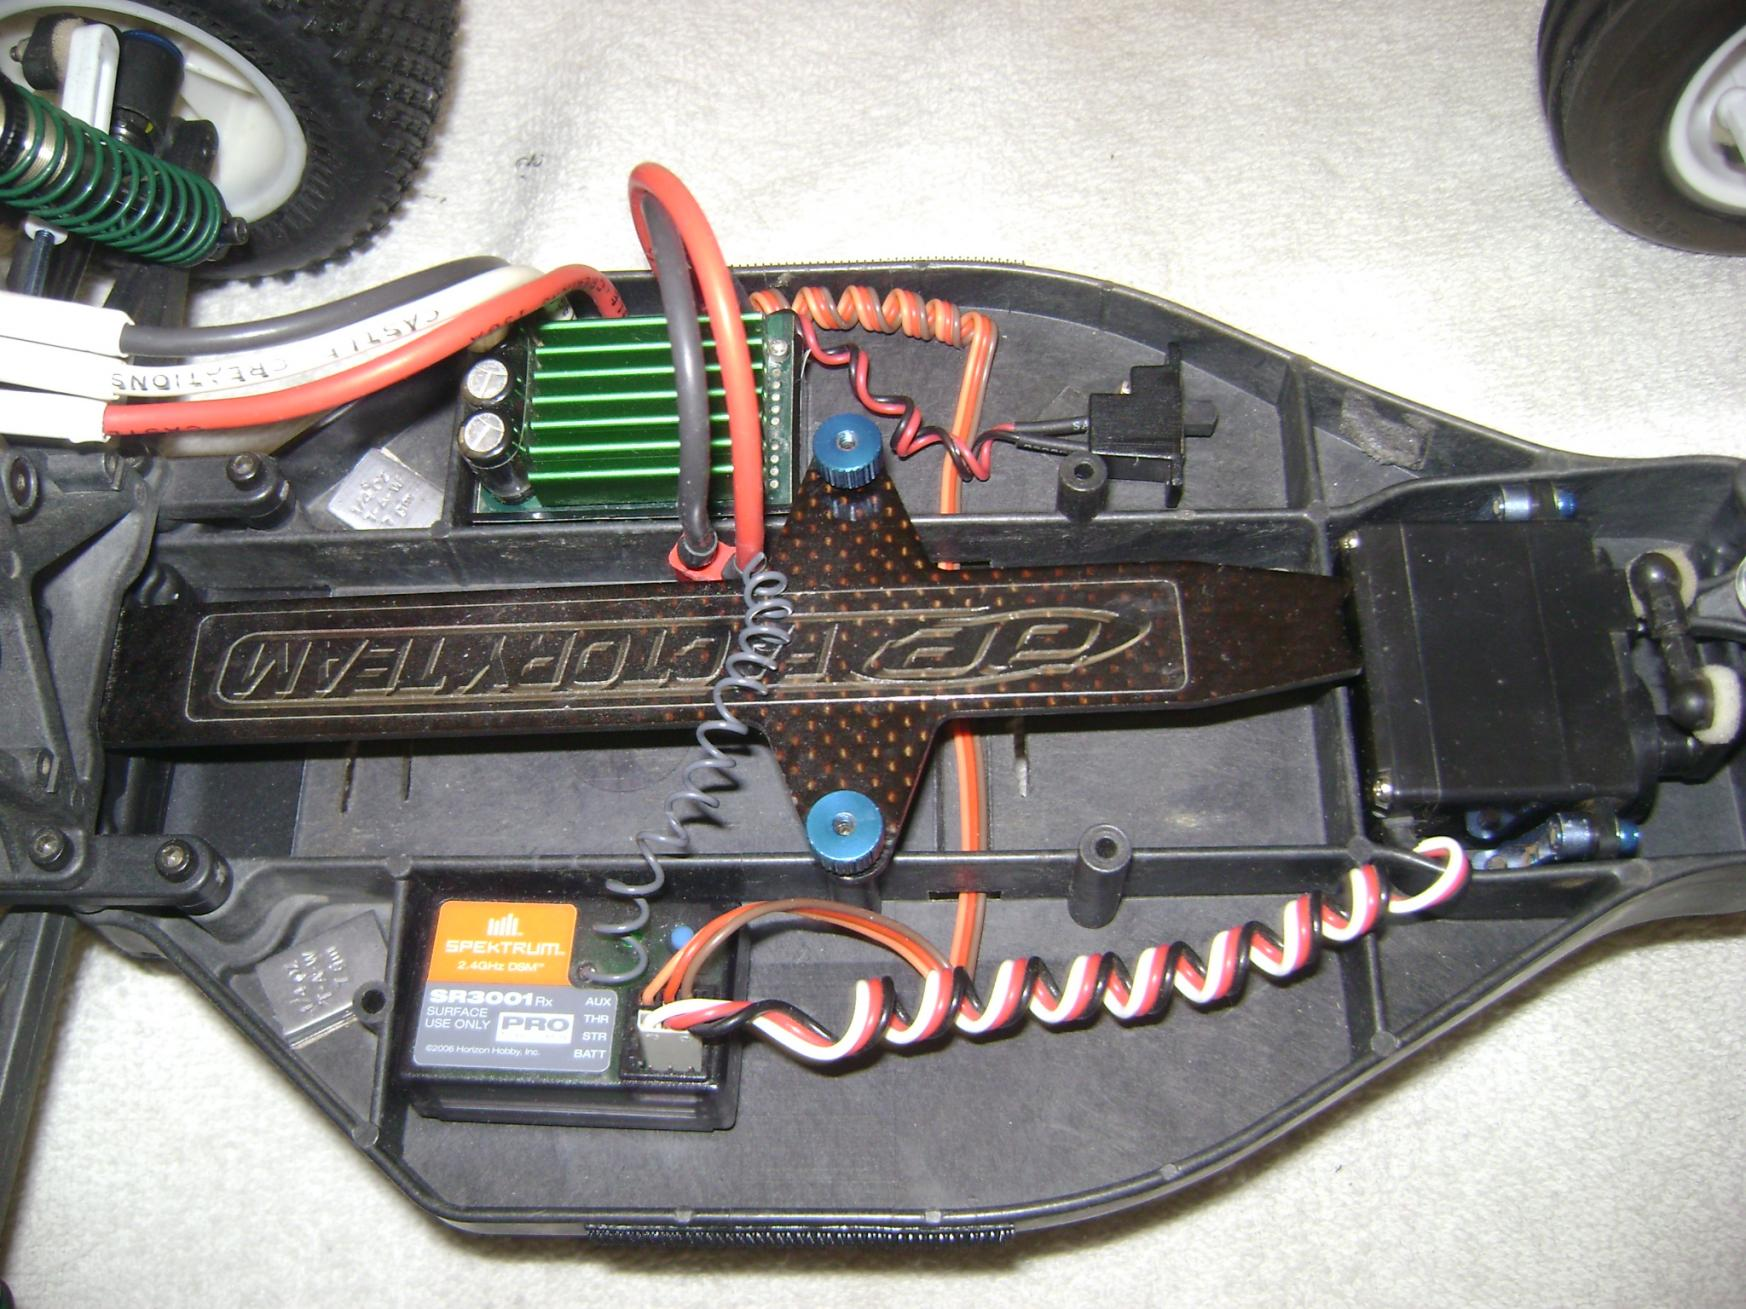 Automotive A C Wiring Diagram On Tahoe Power Window Wiring Diagram Gm